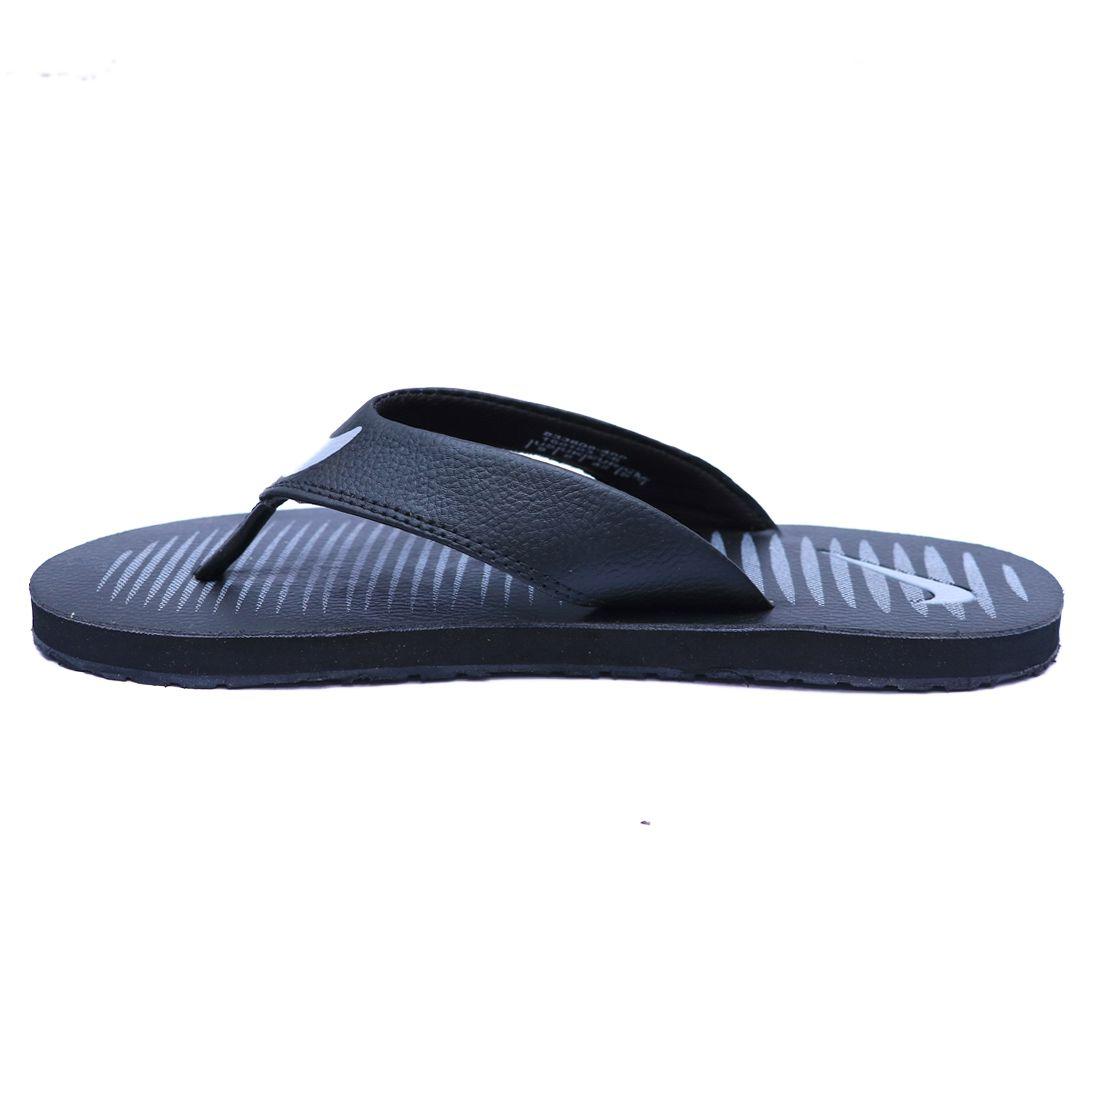 ... Nike CHROMA THONG 5 black Gray Thong Flip Flop ...